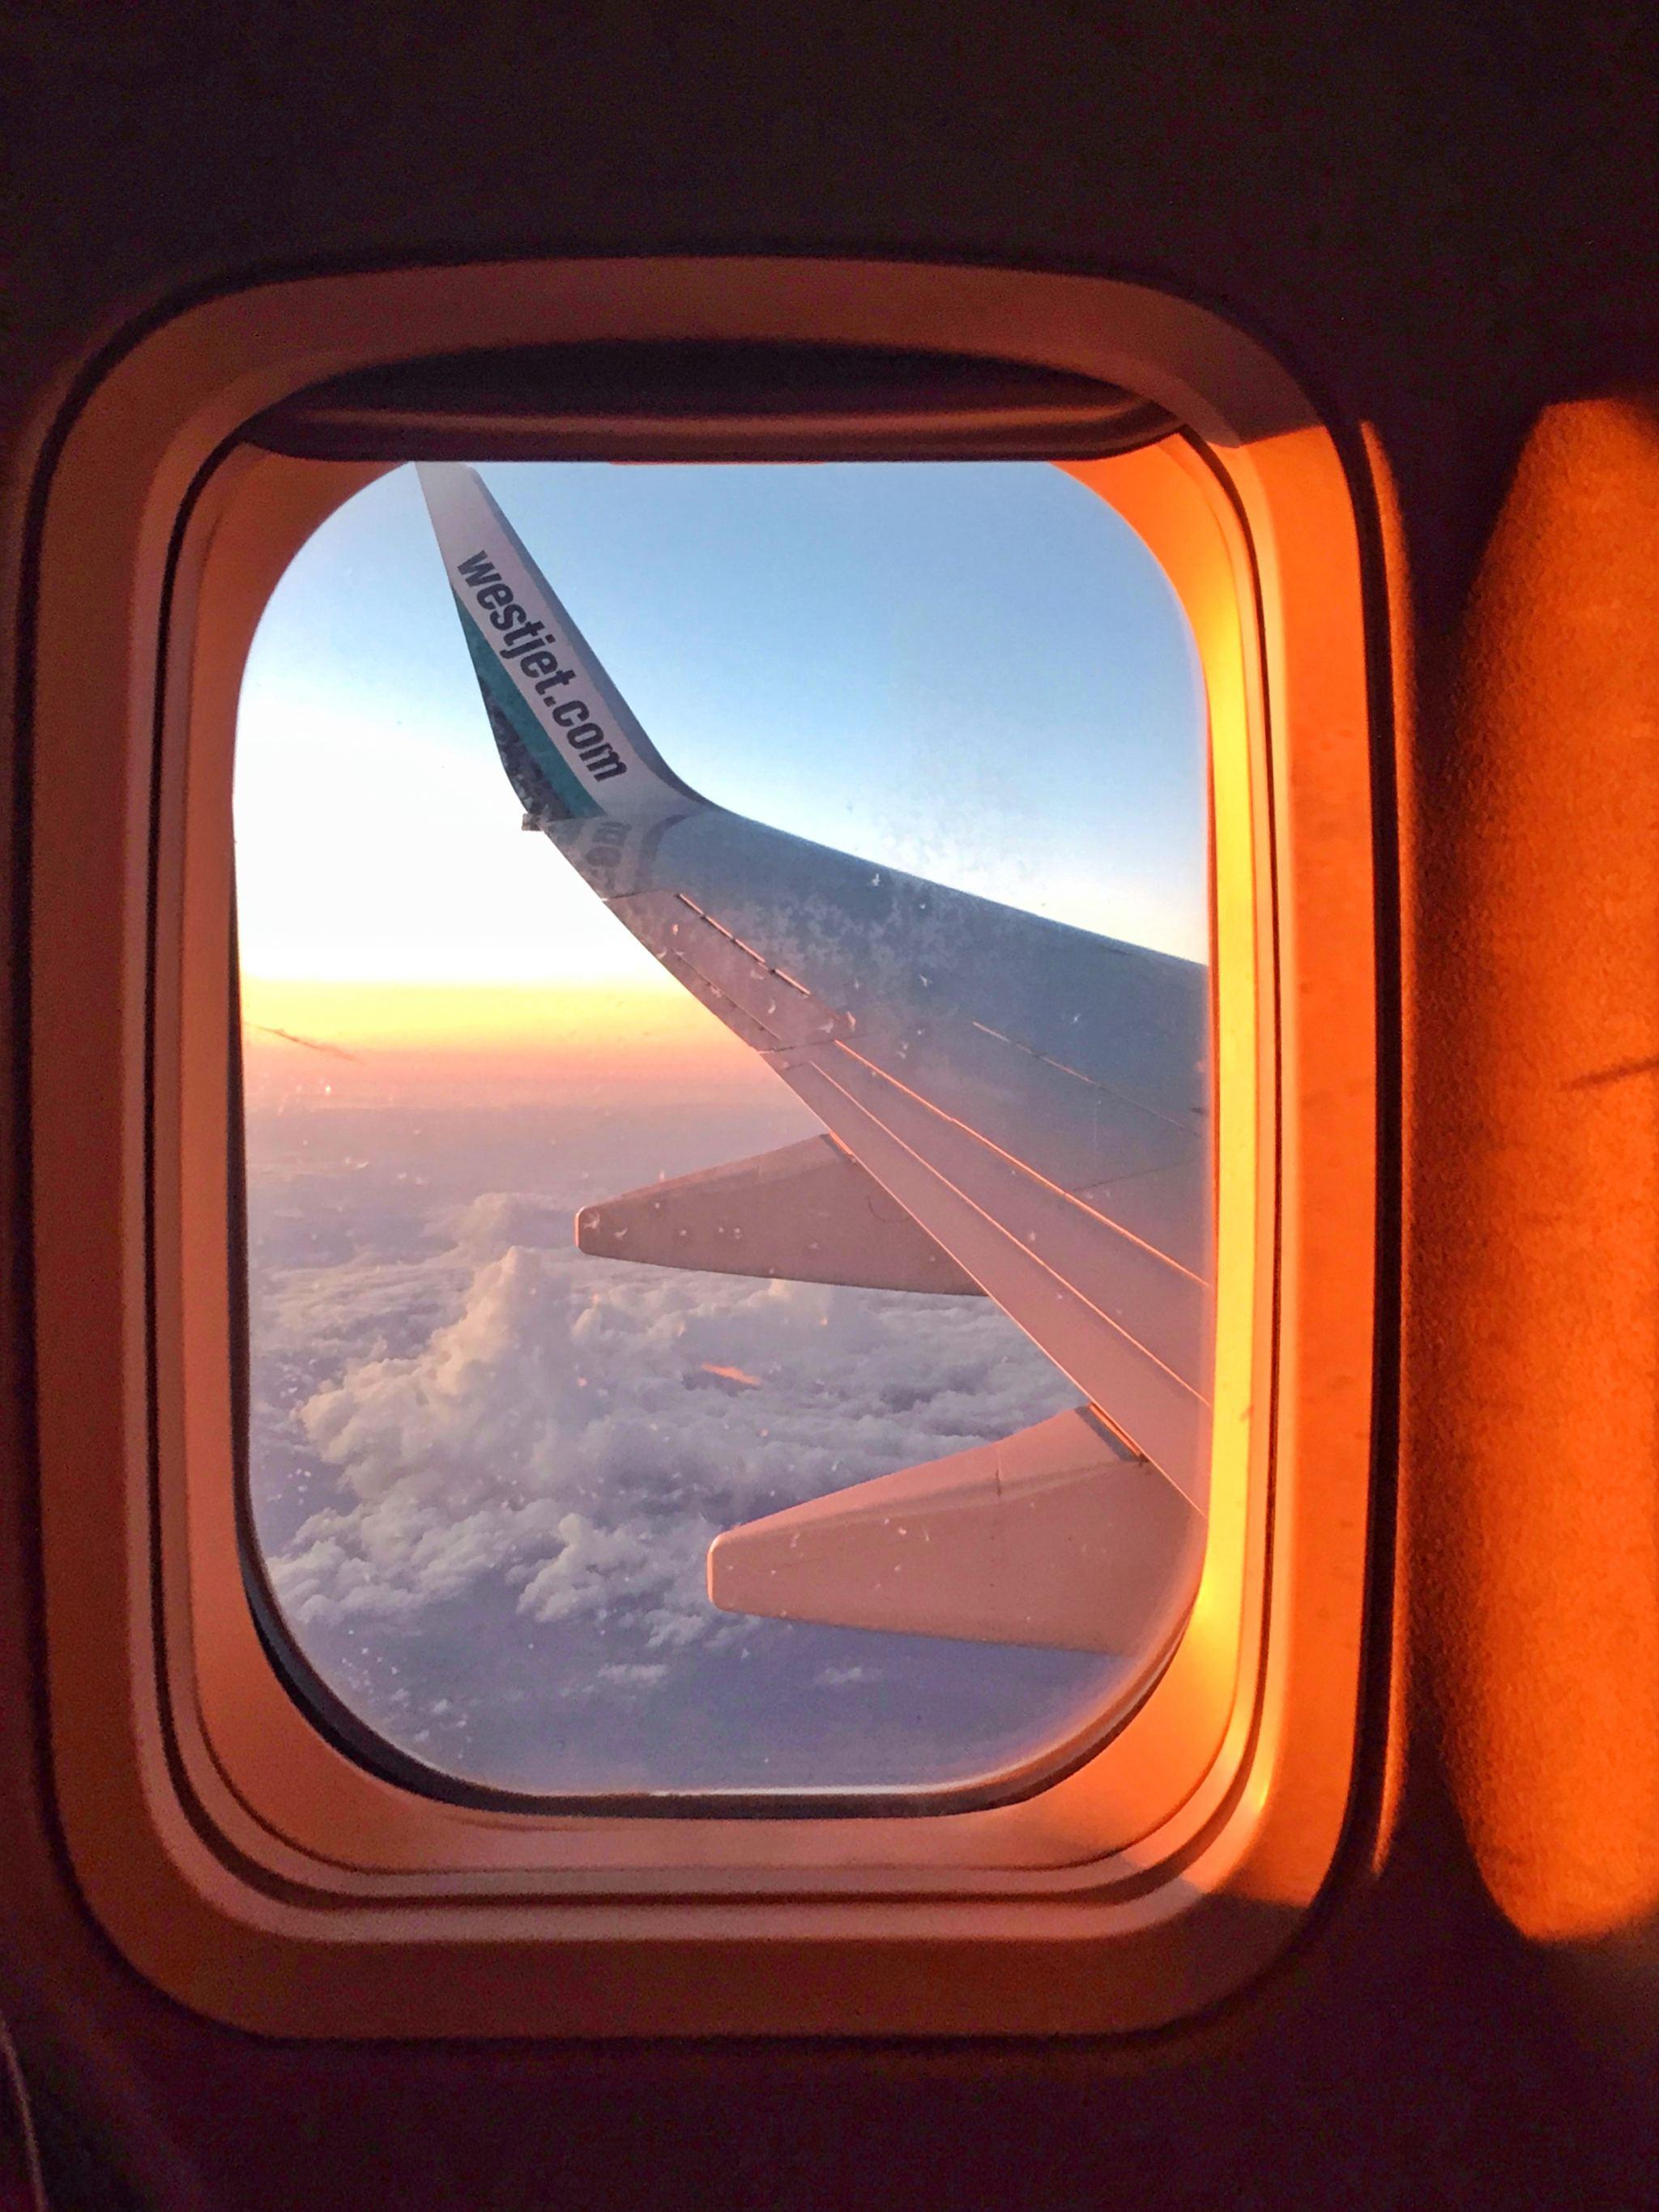 London: Flying from Heathrow